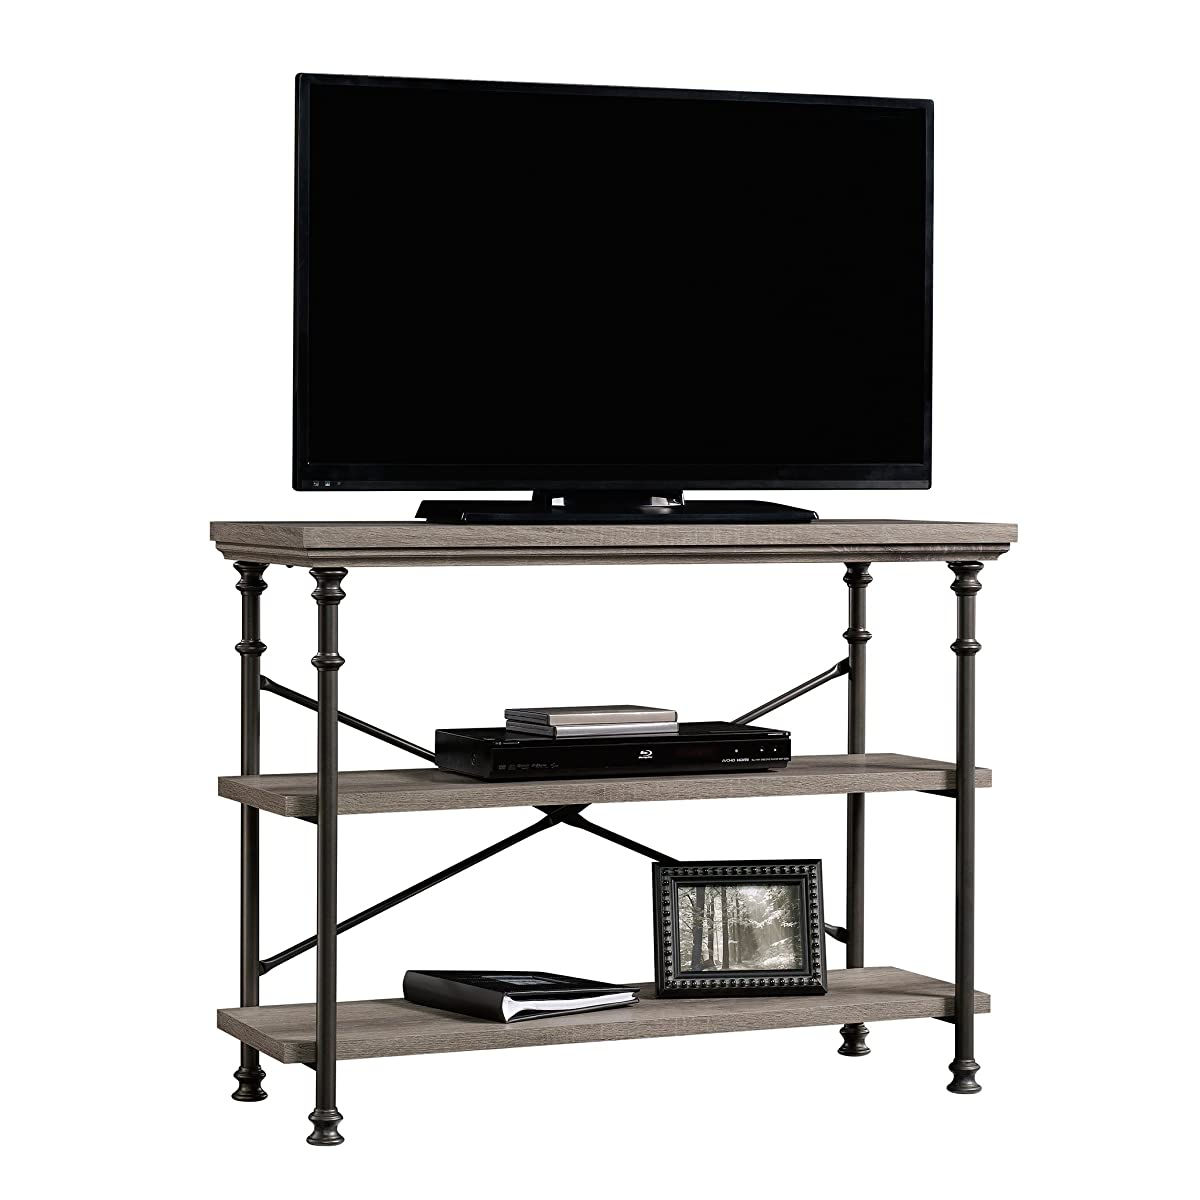 Sauder 419230 Console Table, Northern Oak